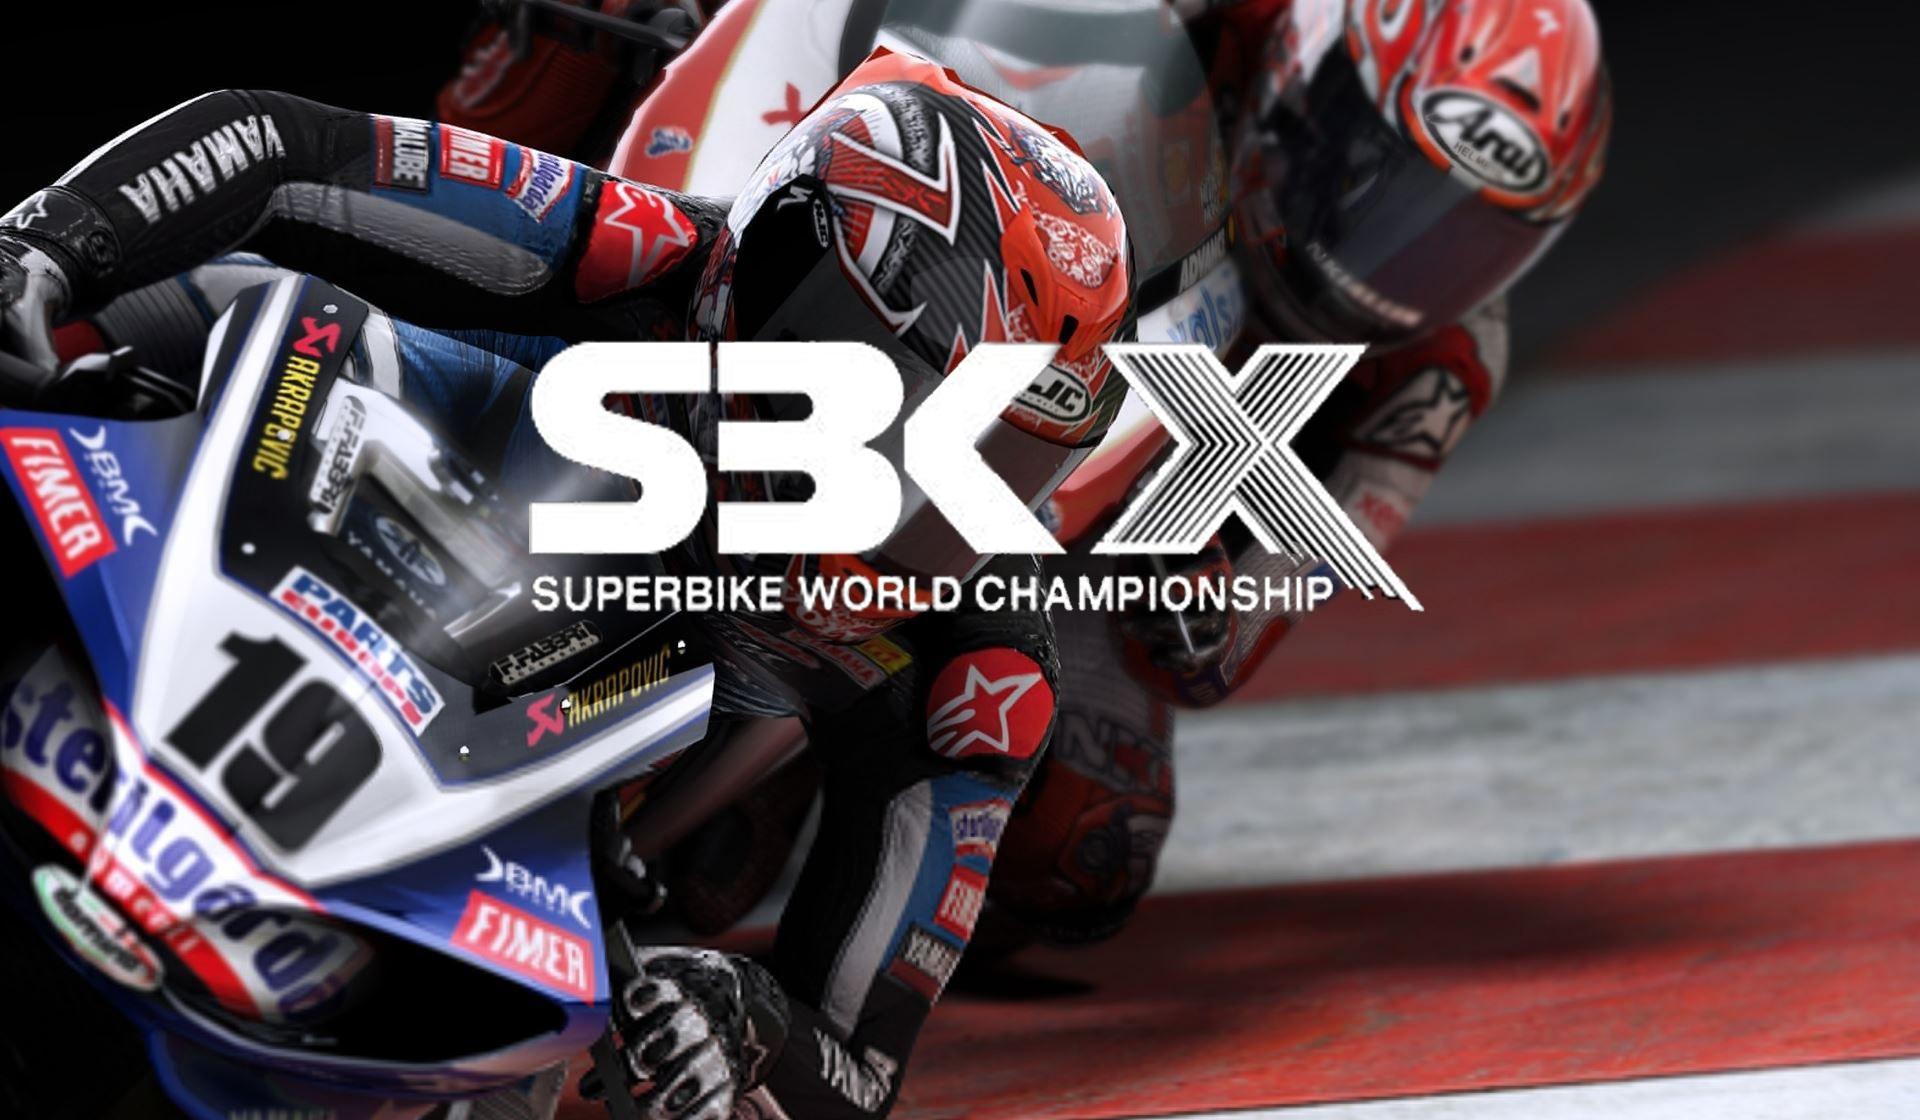 2010 Superbike World Championship